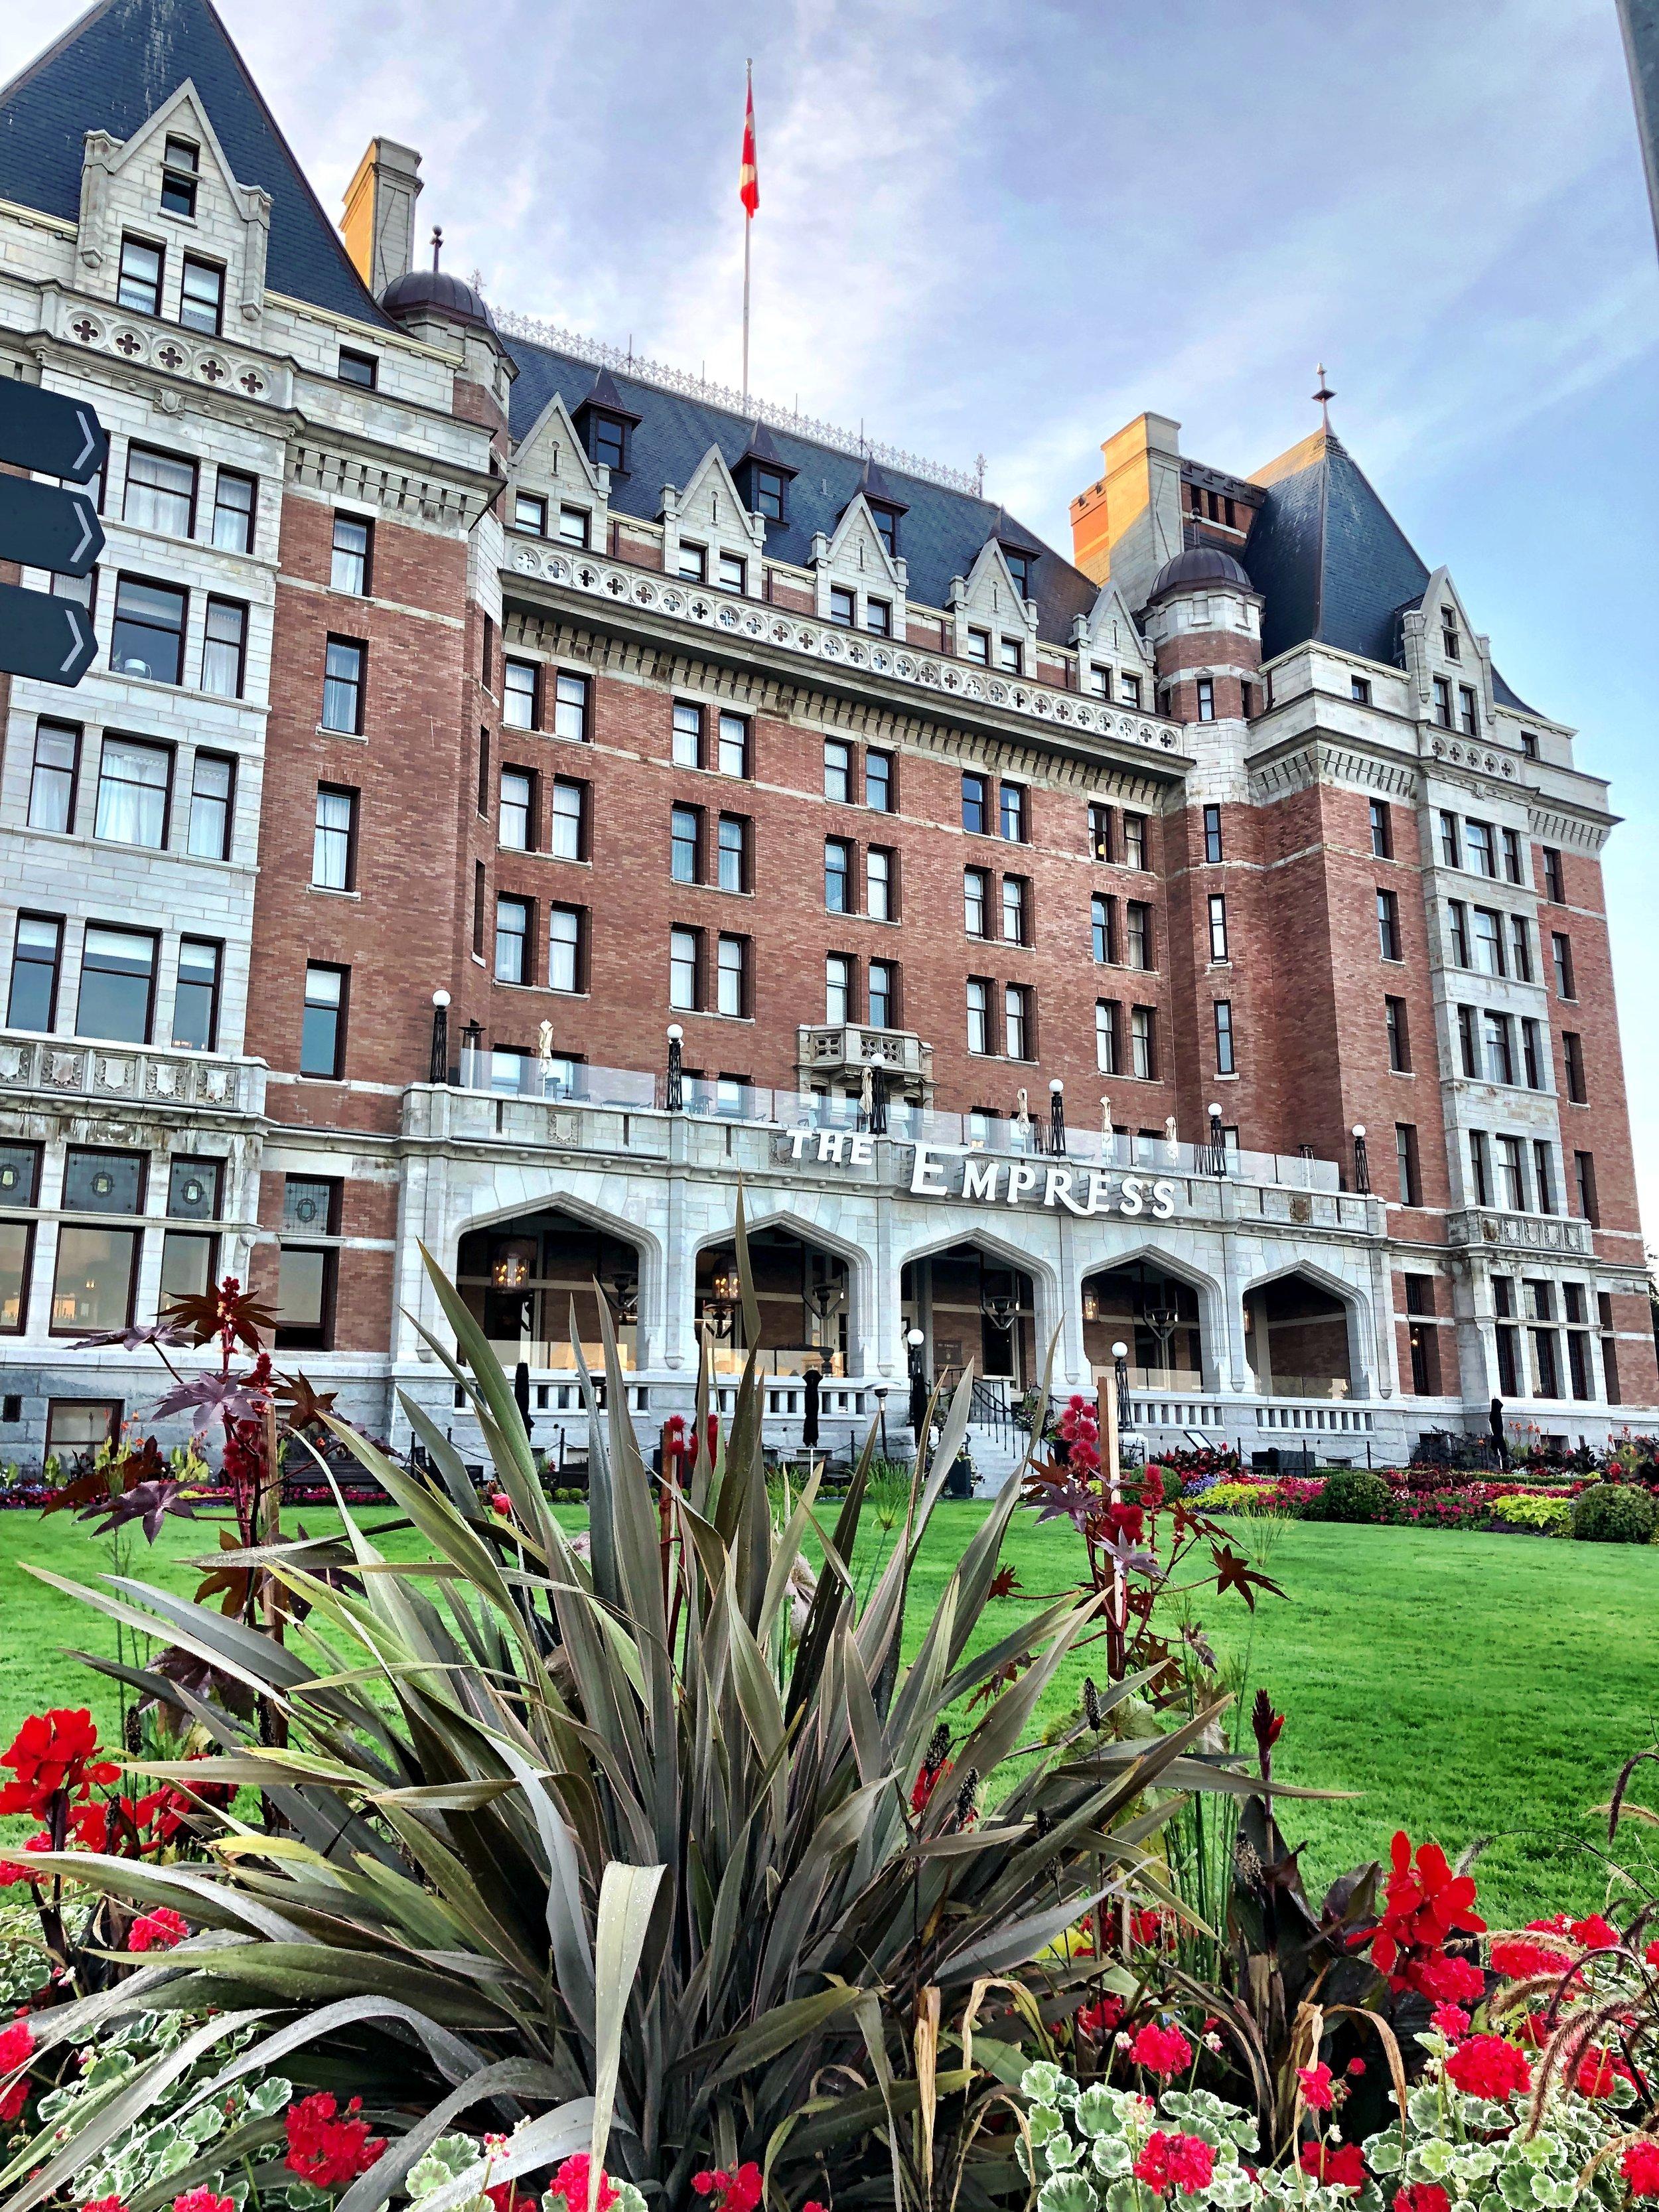 The Fairmont Empress Hotel in Victoria, BC